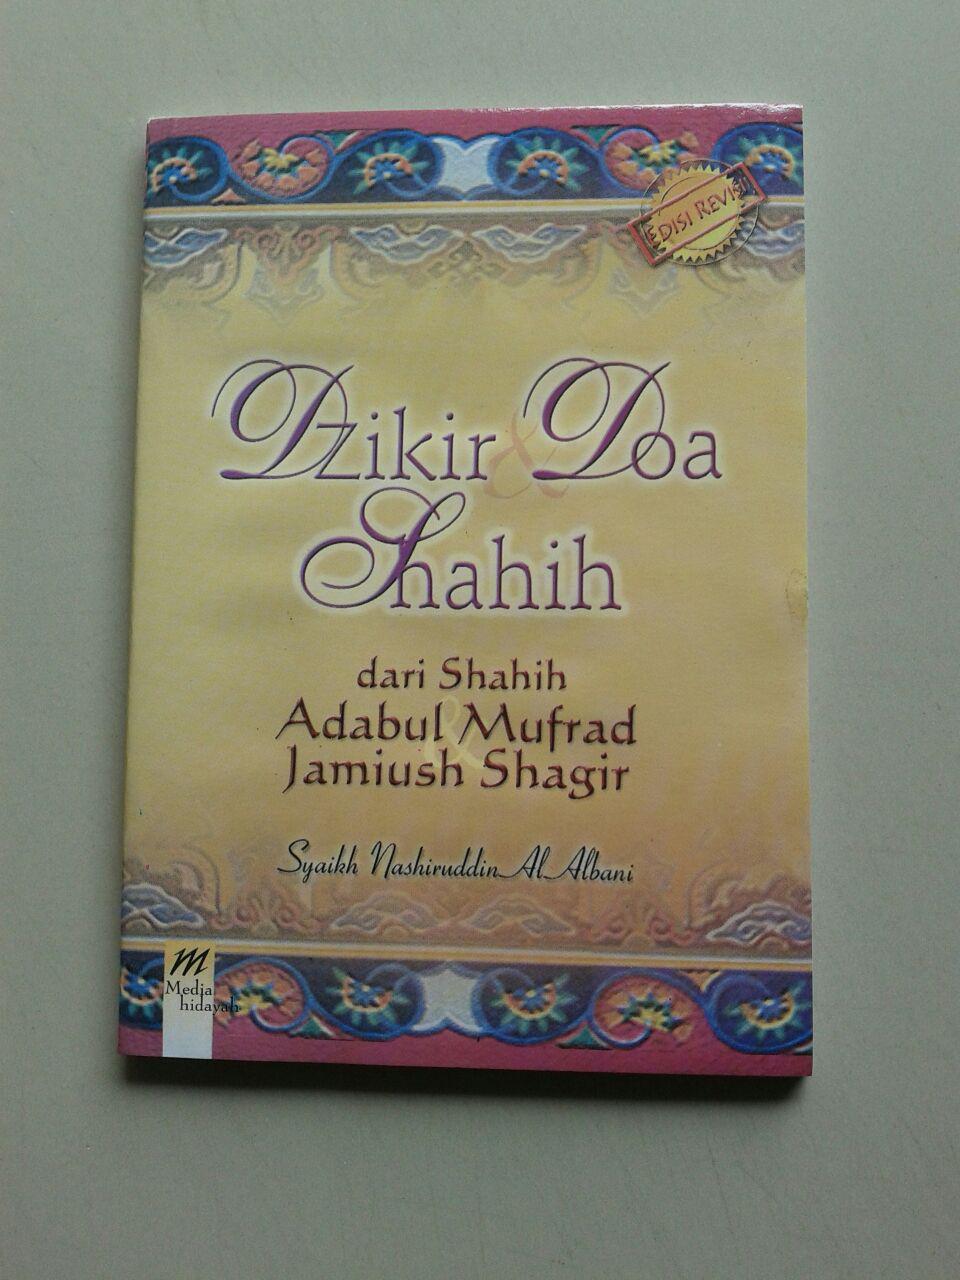 Buku Saku Dzikir Doa Shahih (dari Shahih Adabul Mufrad) cover 2